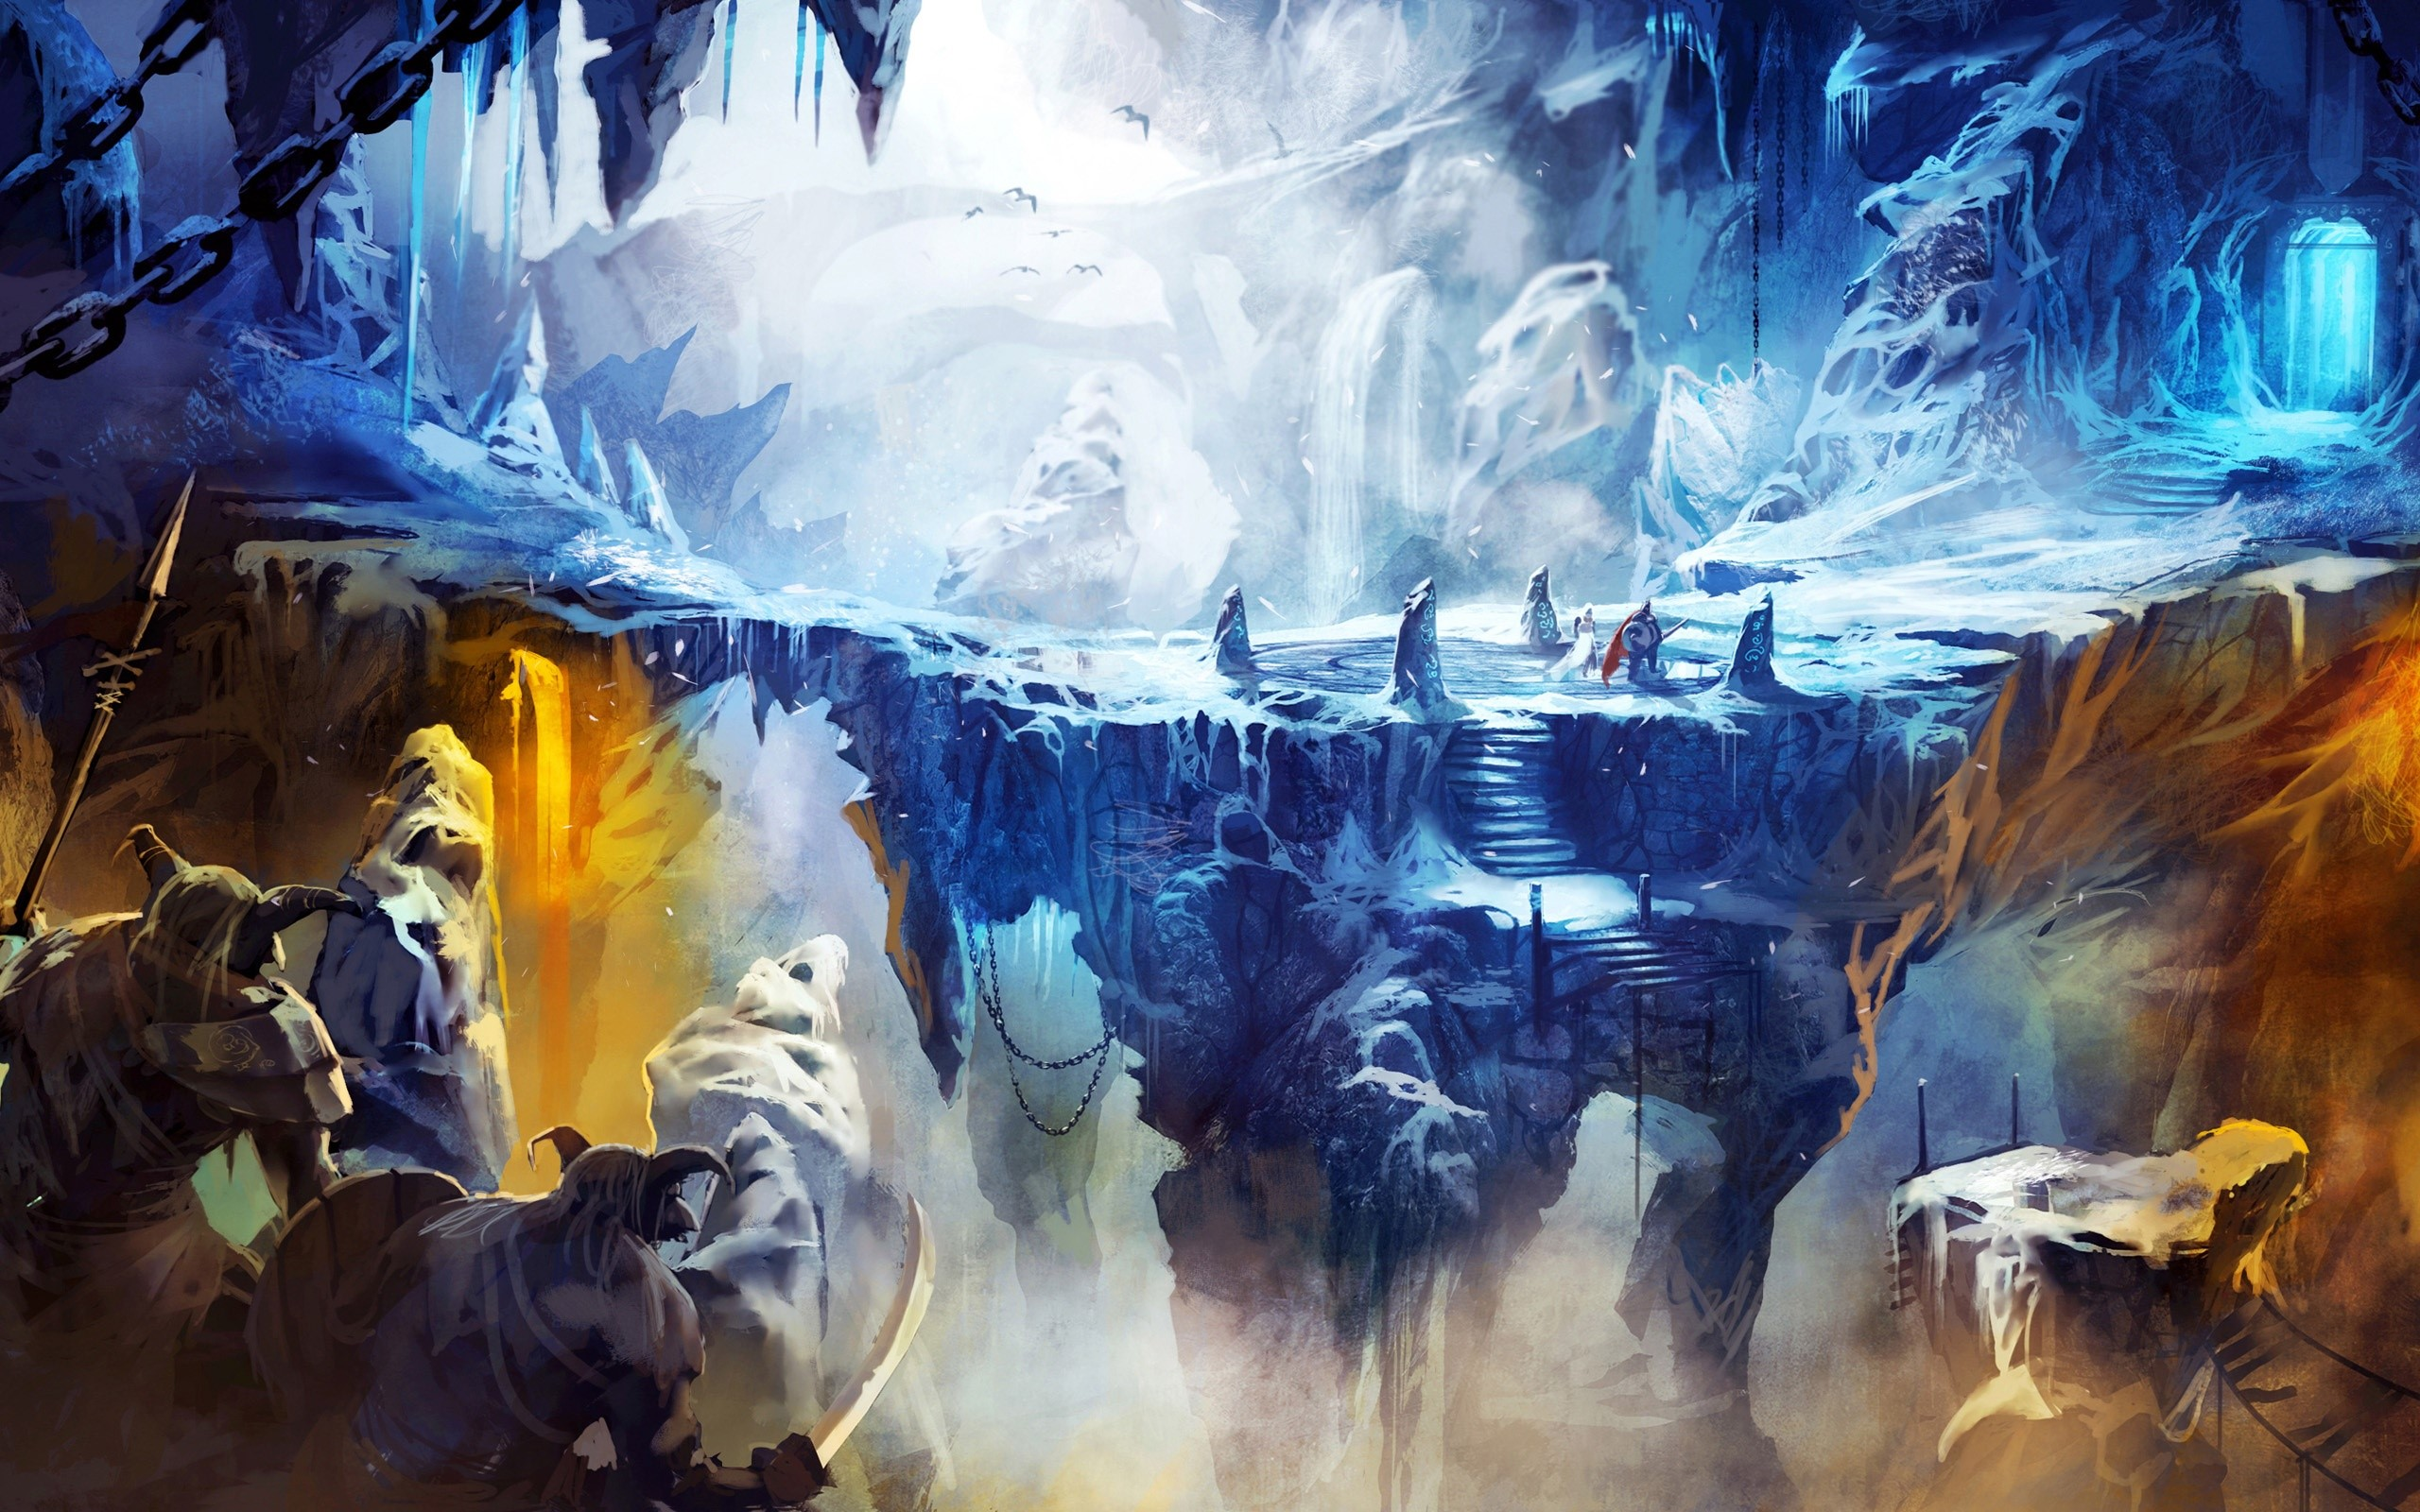 Wallpaper Cueva colgelada en trine 2 Images